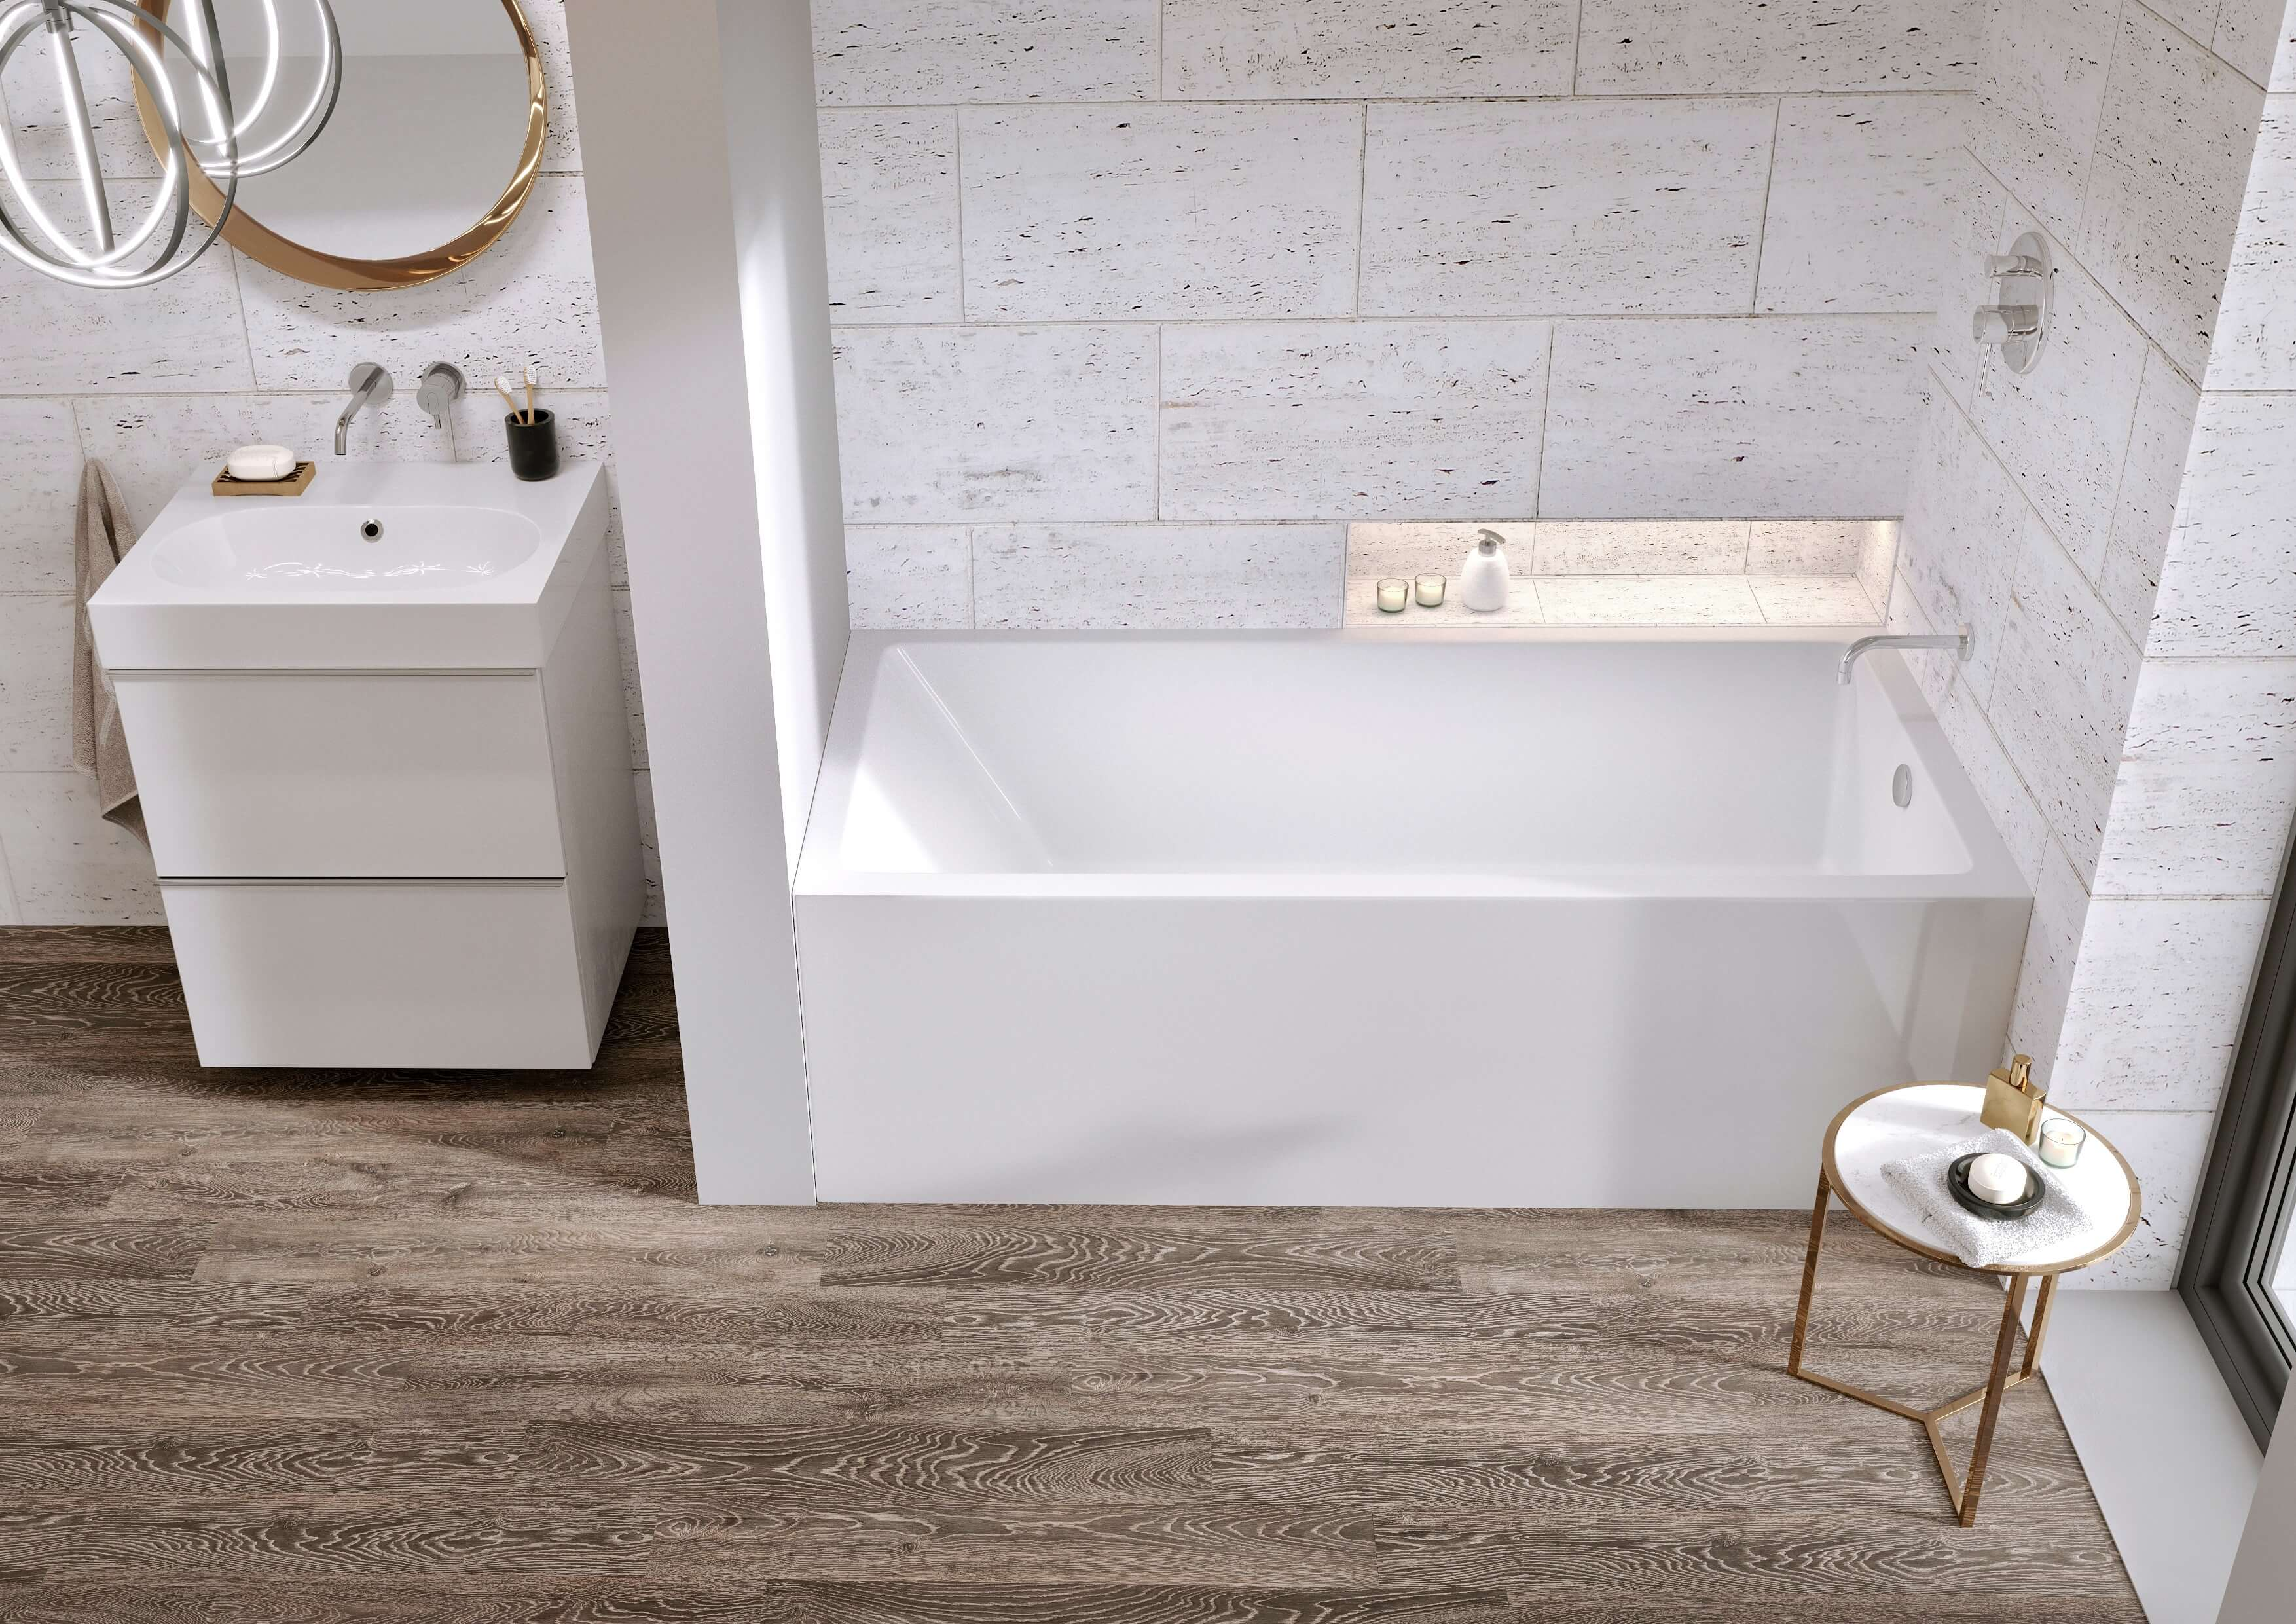 improvement ca terra pdp reviews soaking x decors home ove bathtub wayfair